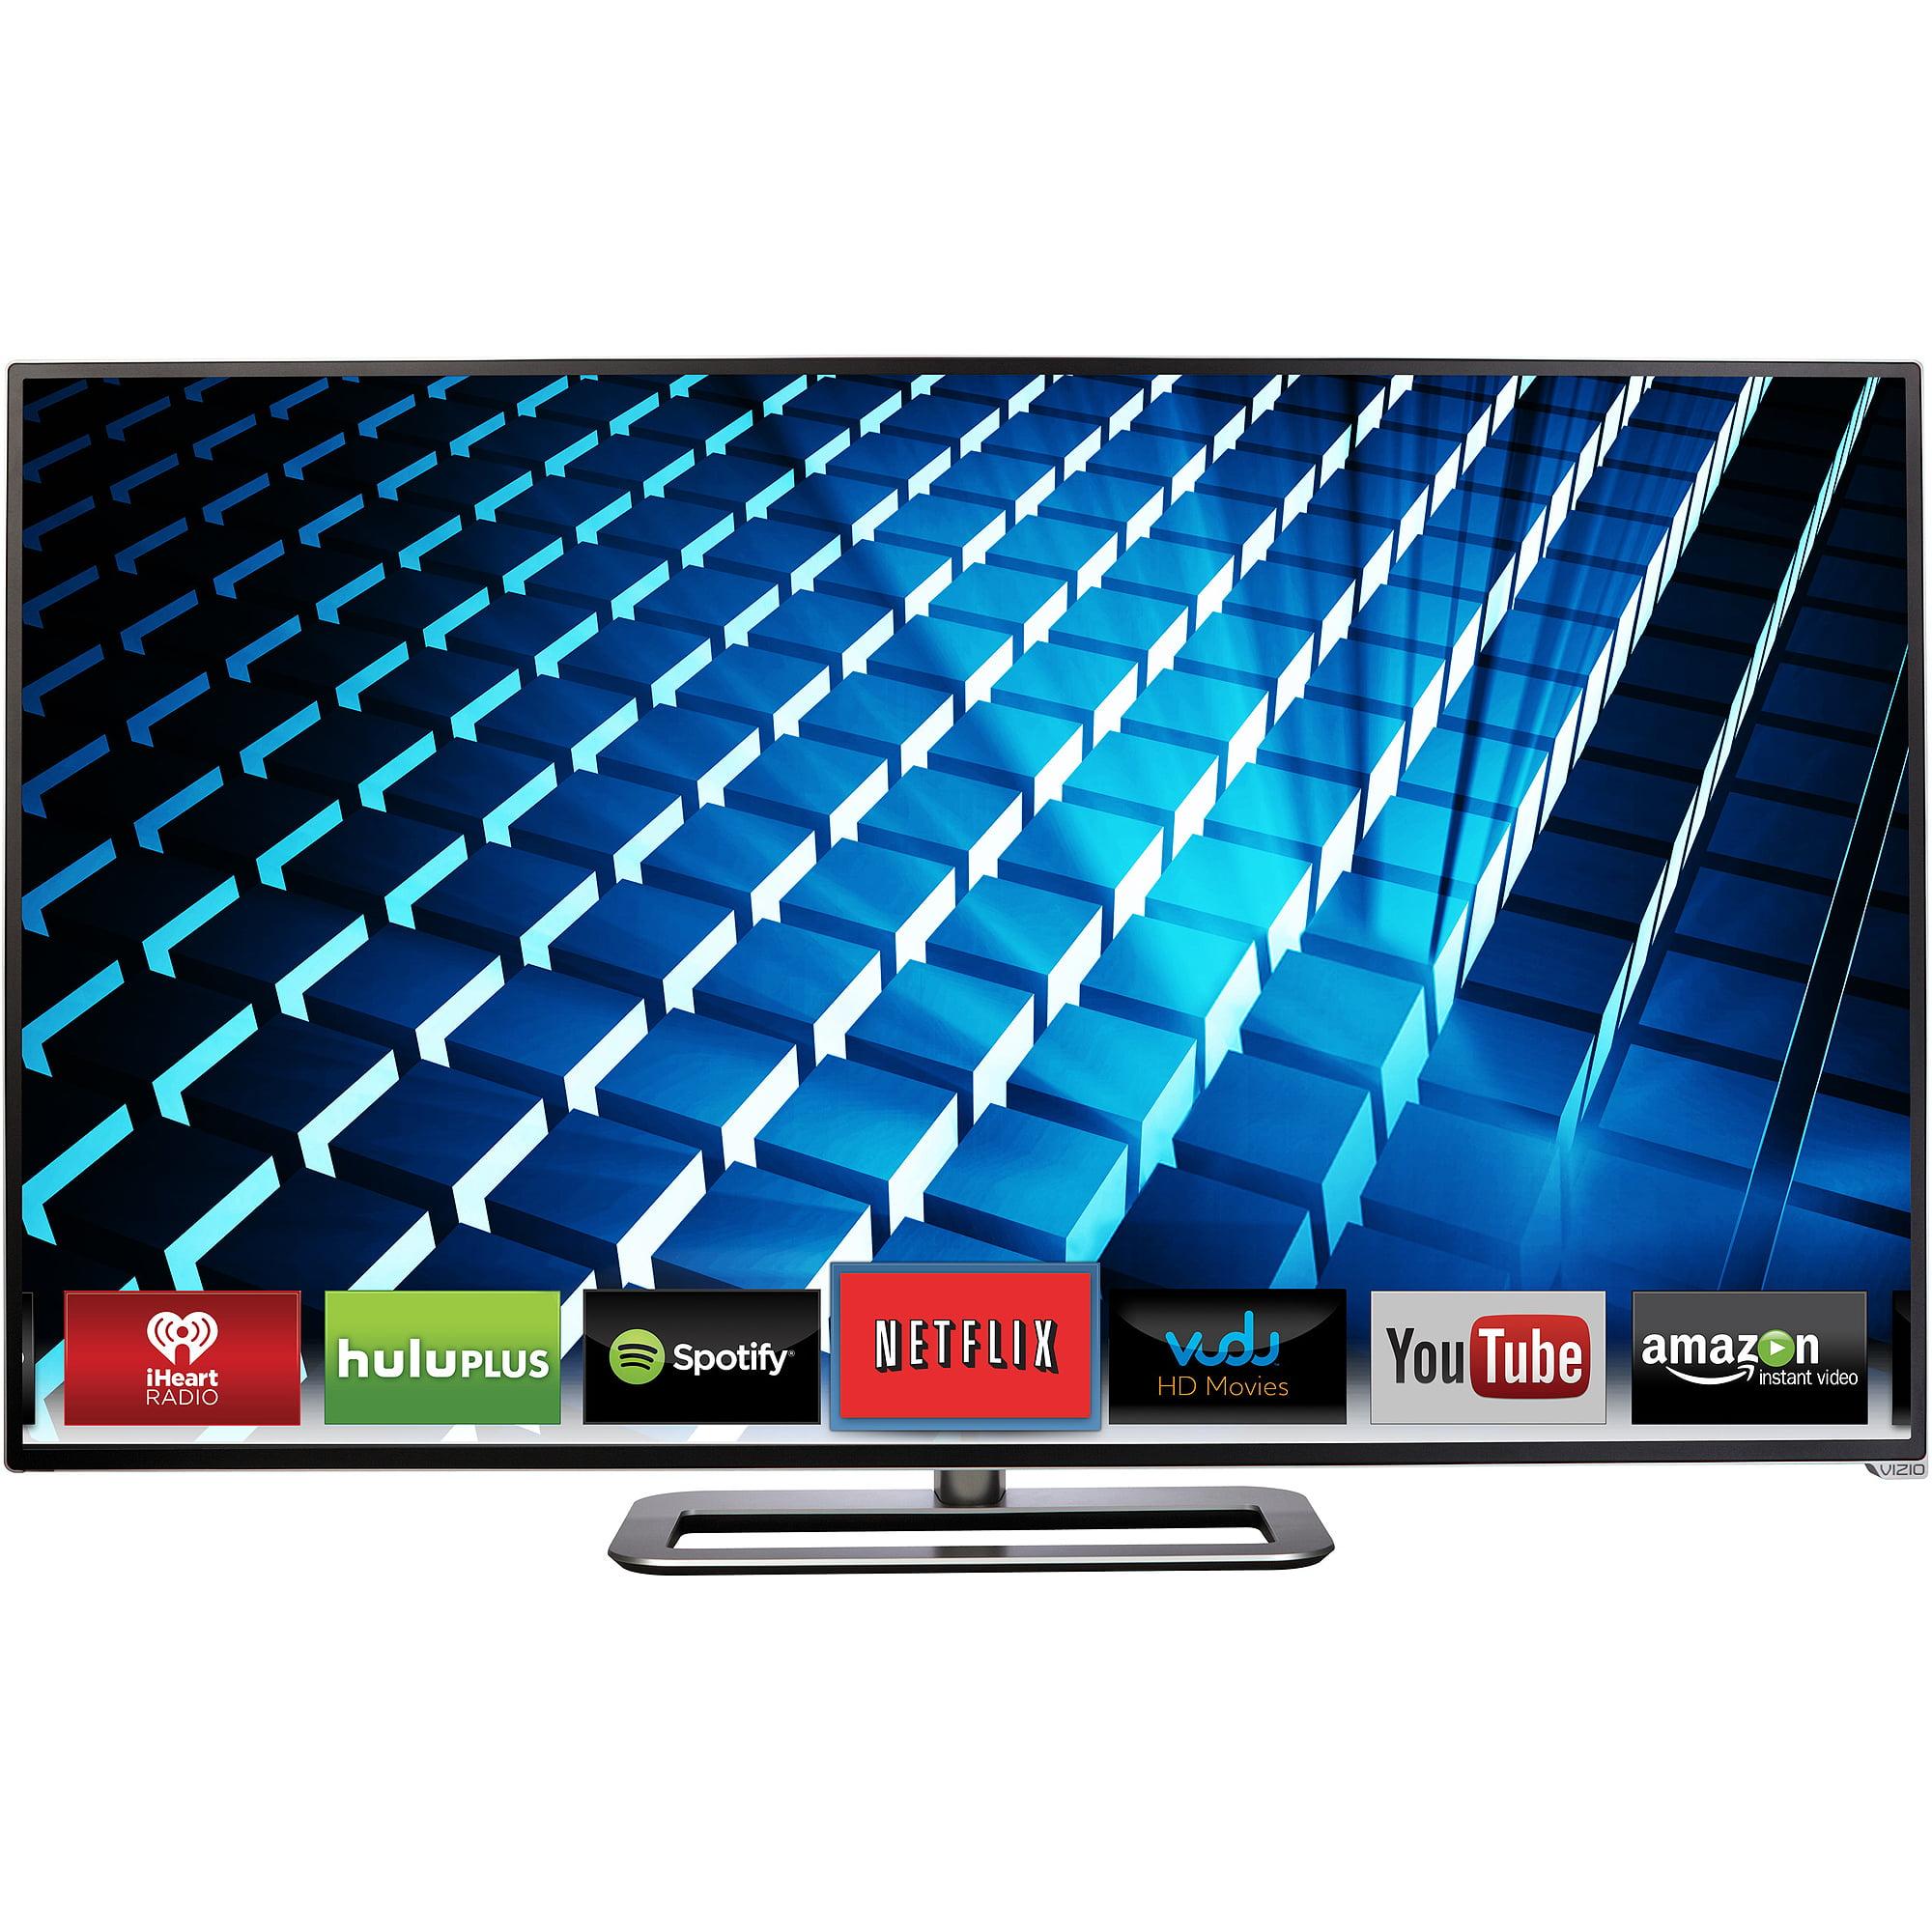 "VIZIO M702i-B3 70"" 1080p 240Hz Class LED Smart HDTV - Qualifies for Premium Delivery"